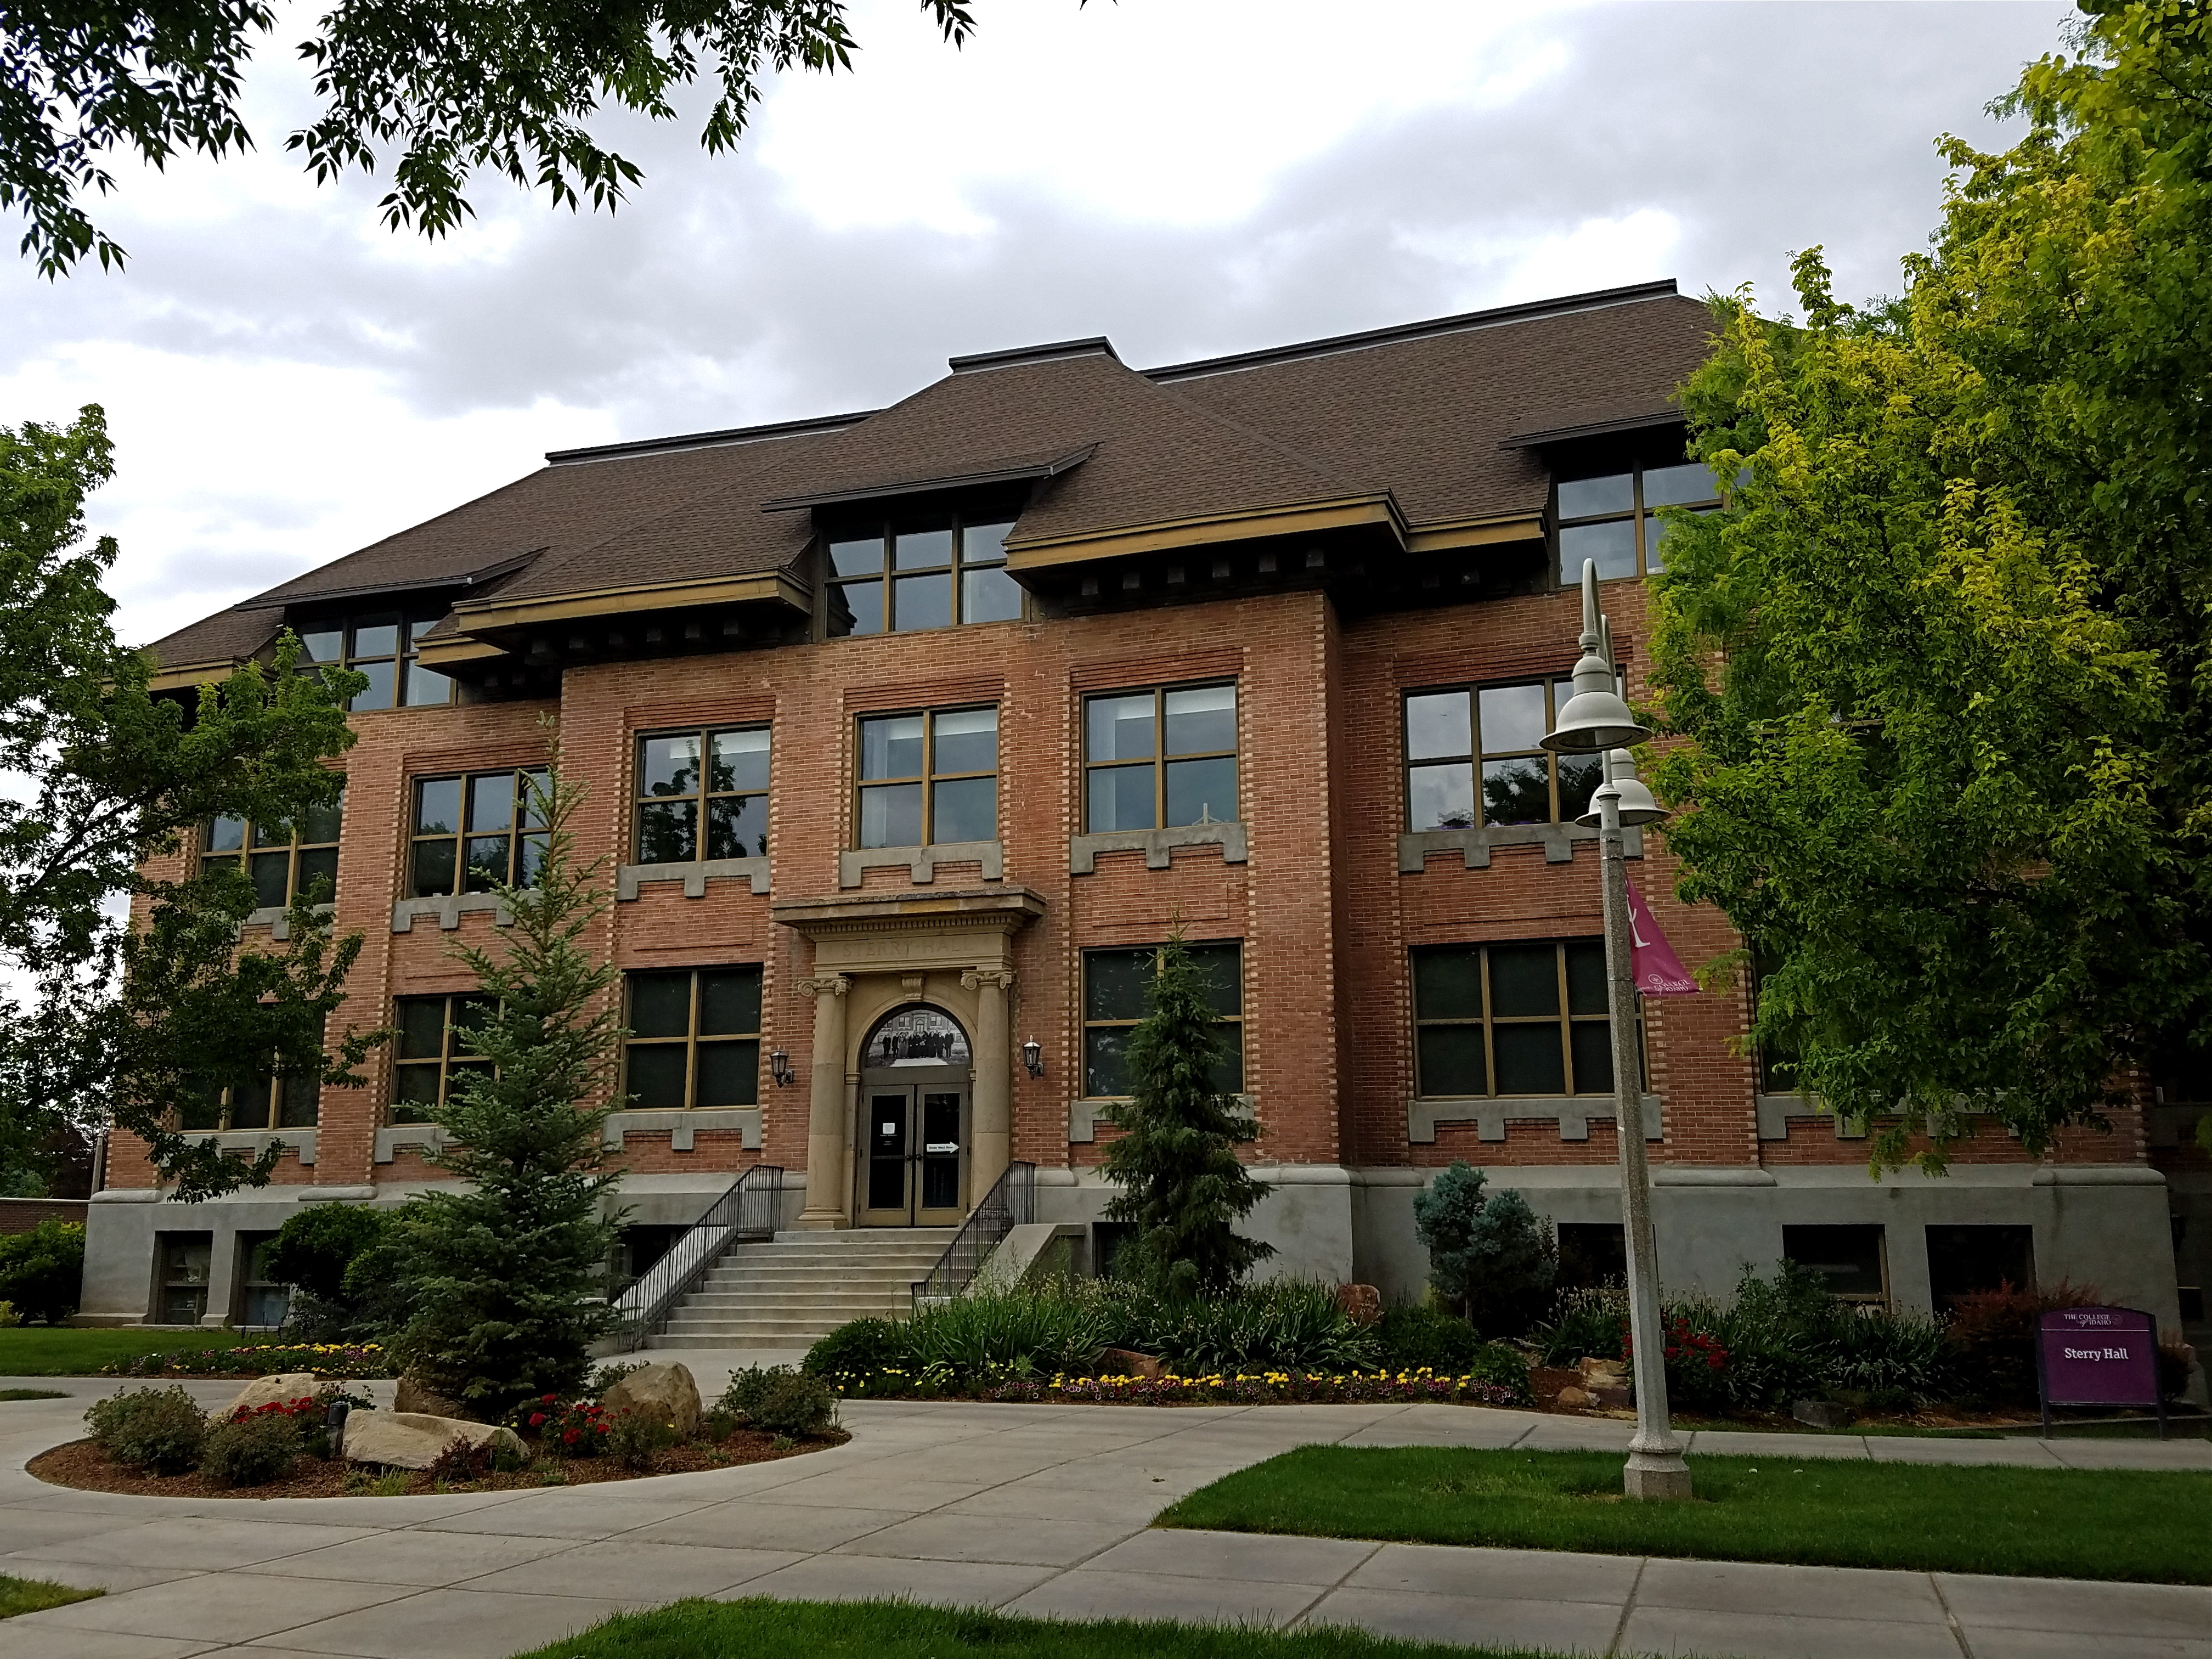 College Of Idaho >> Sterry Hall Wikipedia